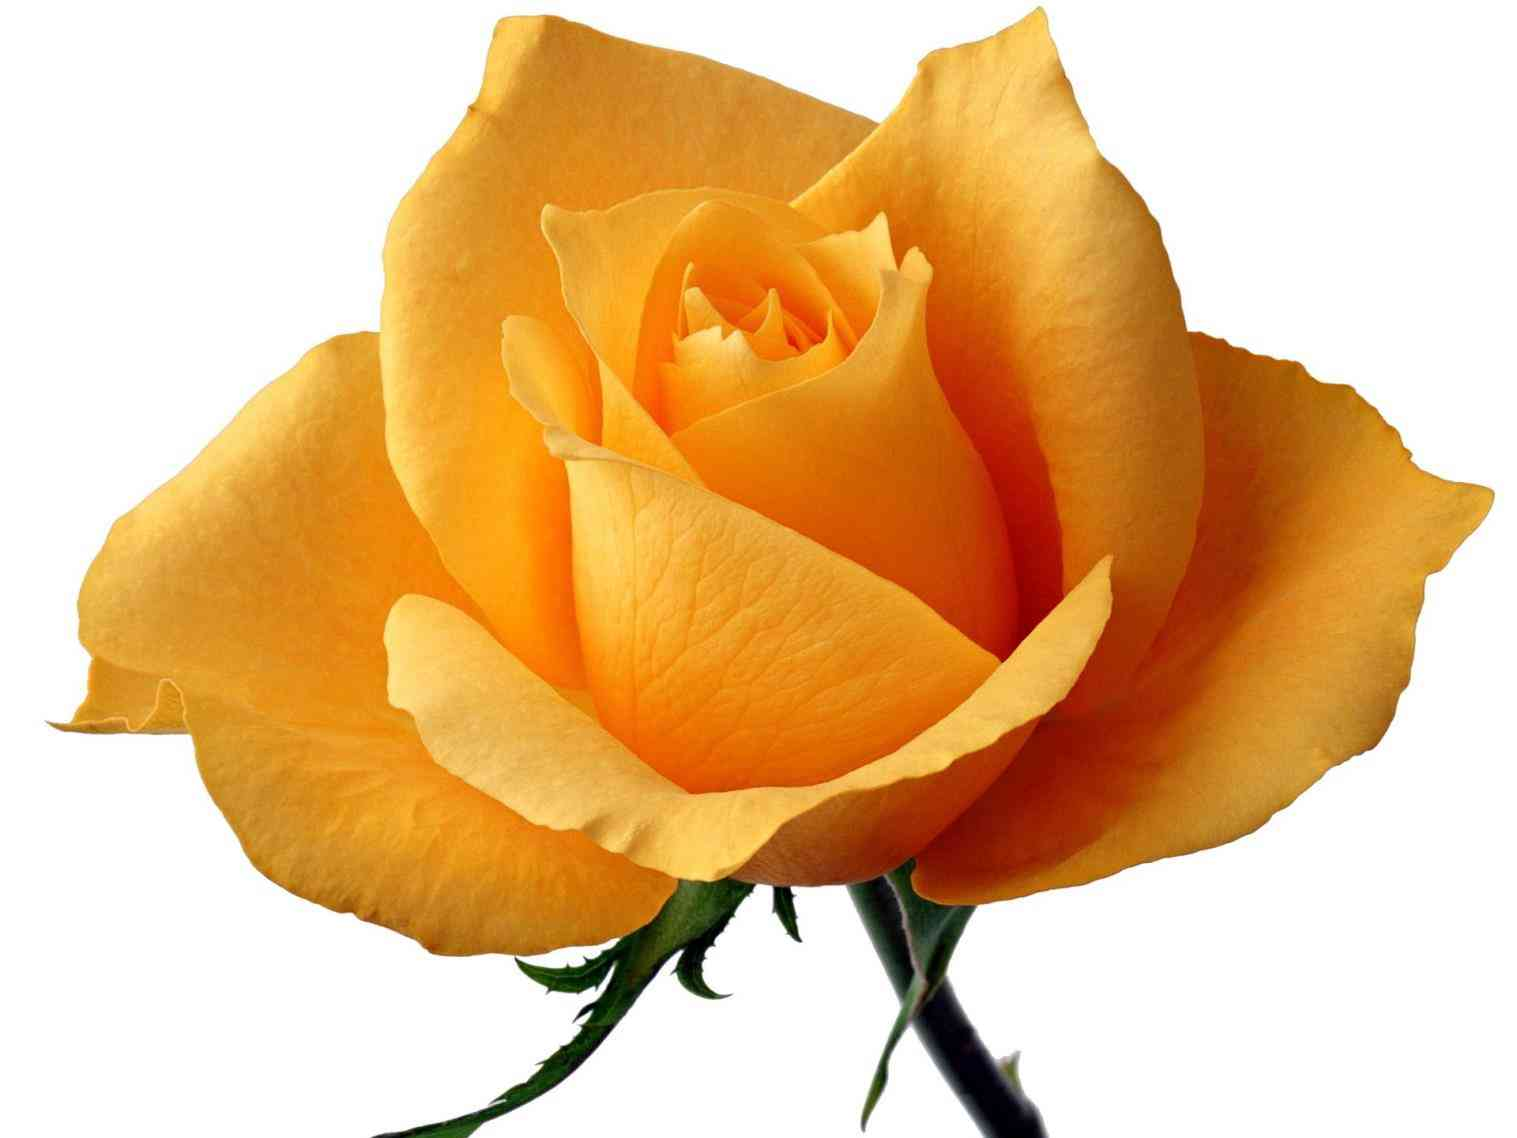 Single Rose Clipart: Free Download Best Long Stem Rose